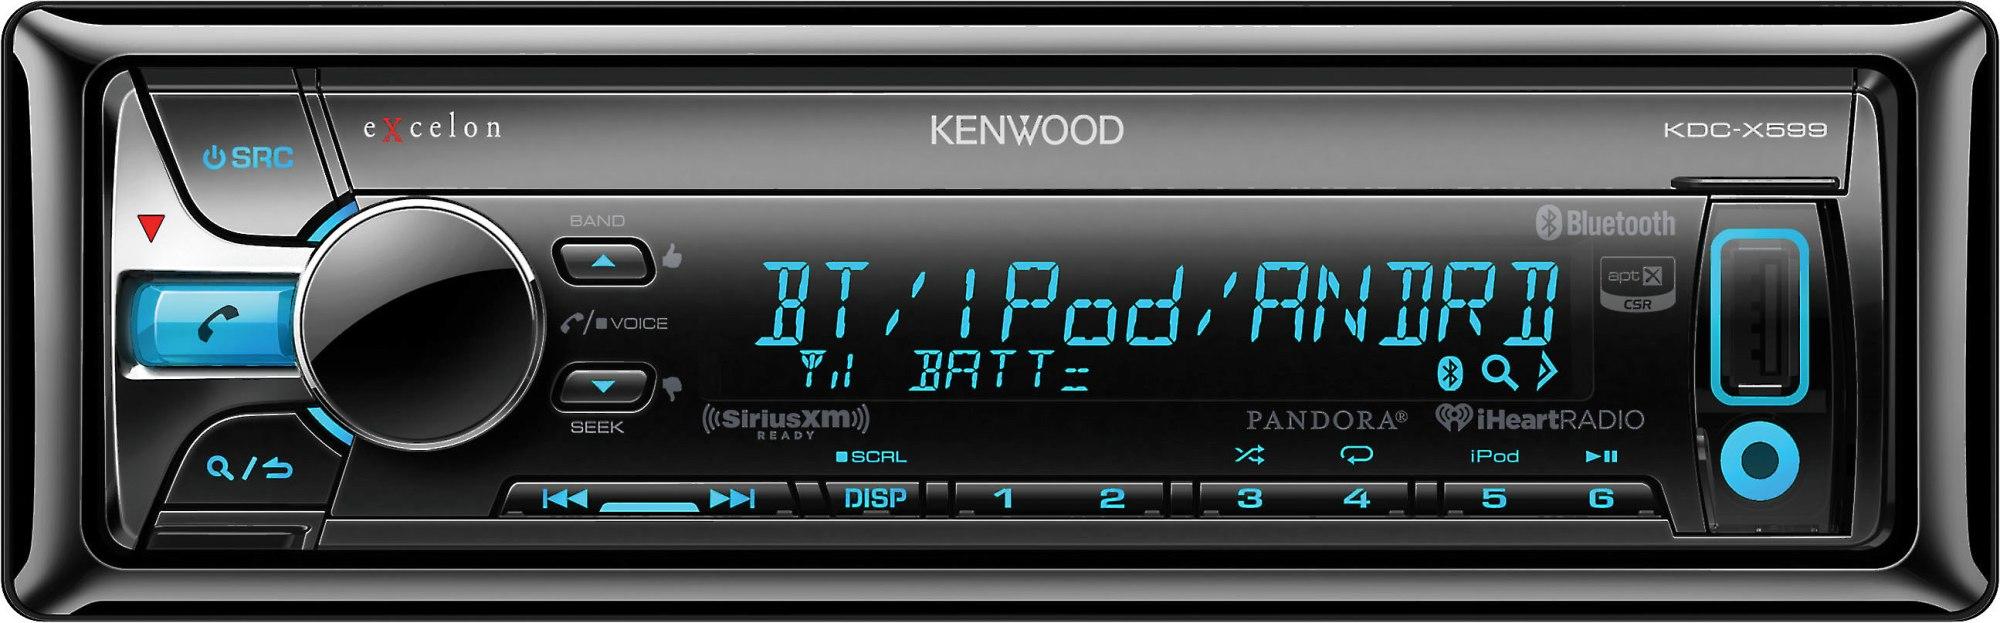 hight resolution of kenwood kdc x591 wiring diagram